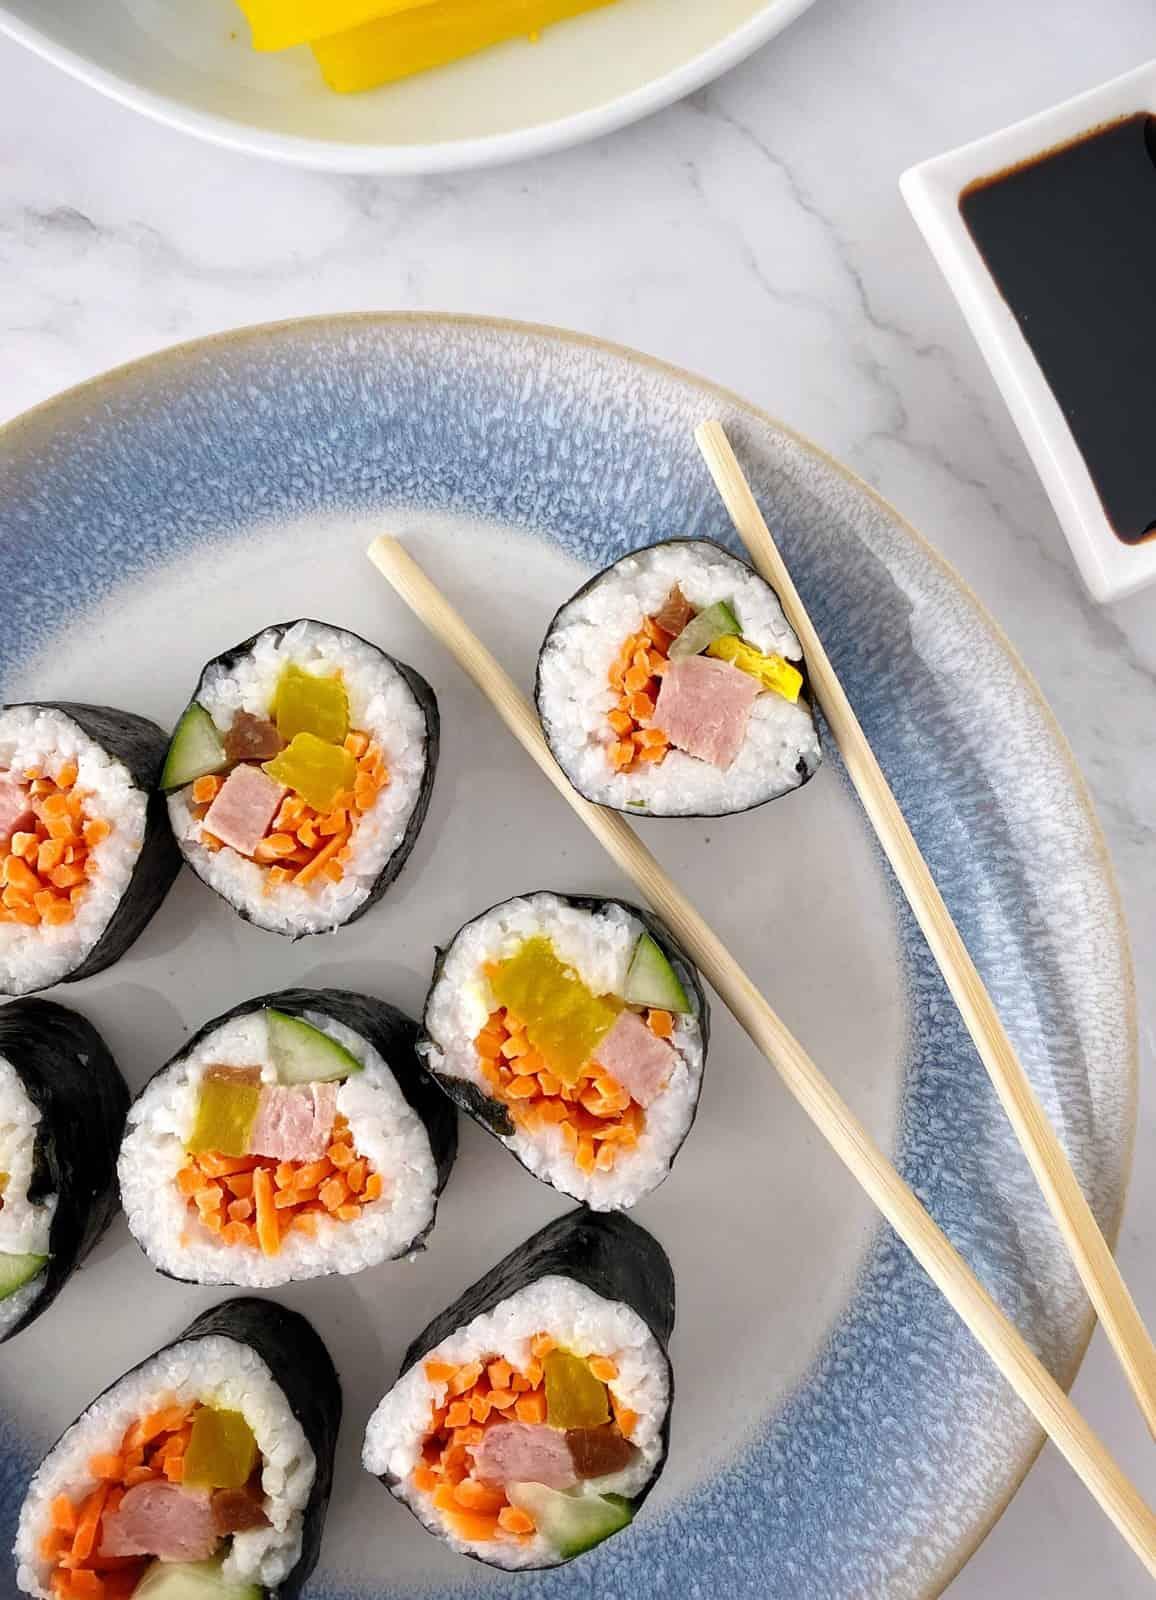 kimbap held with chopsticks on a plate